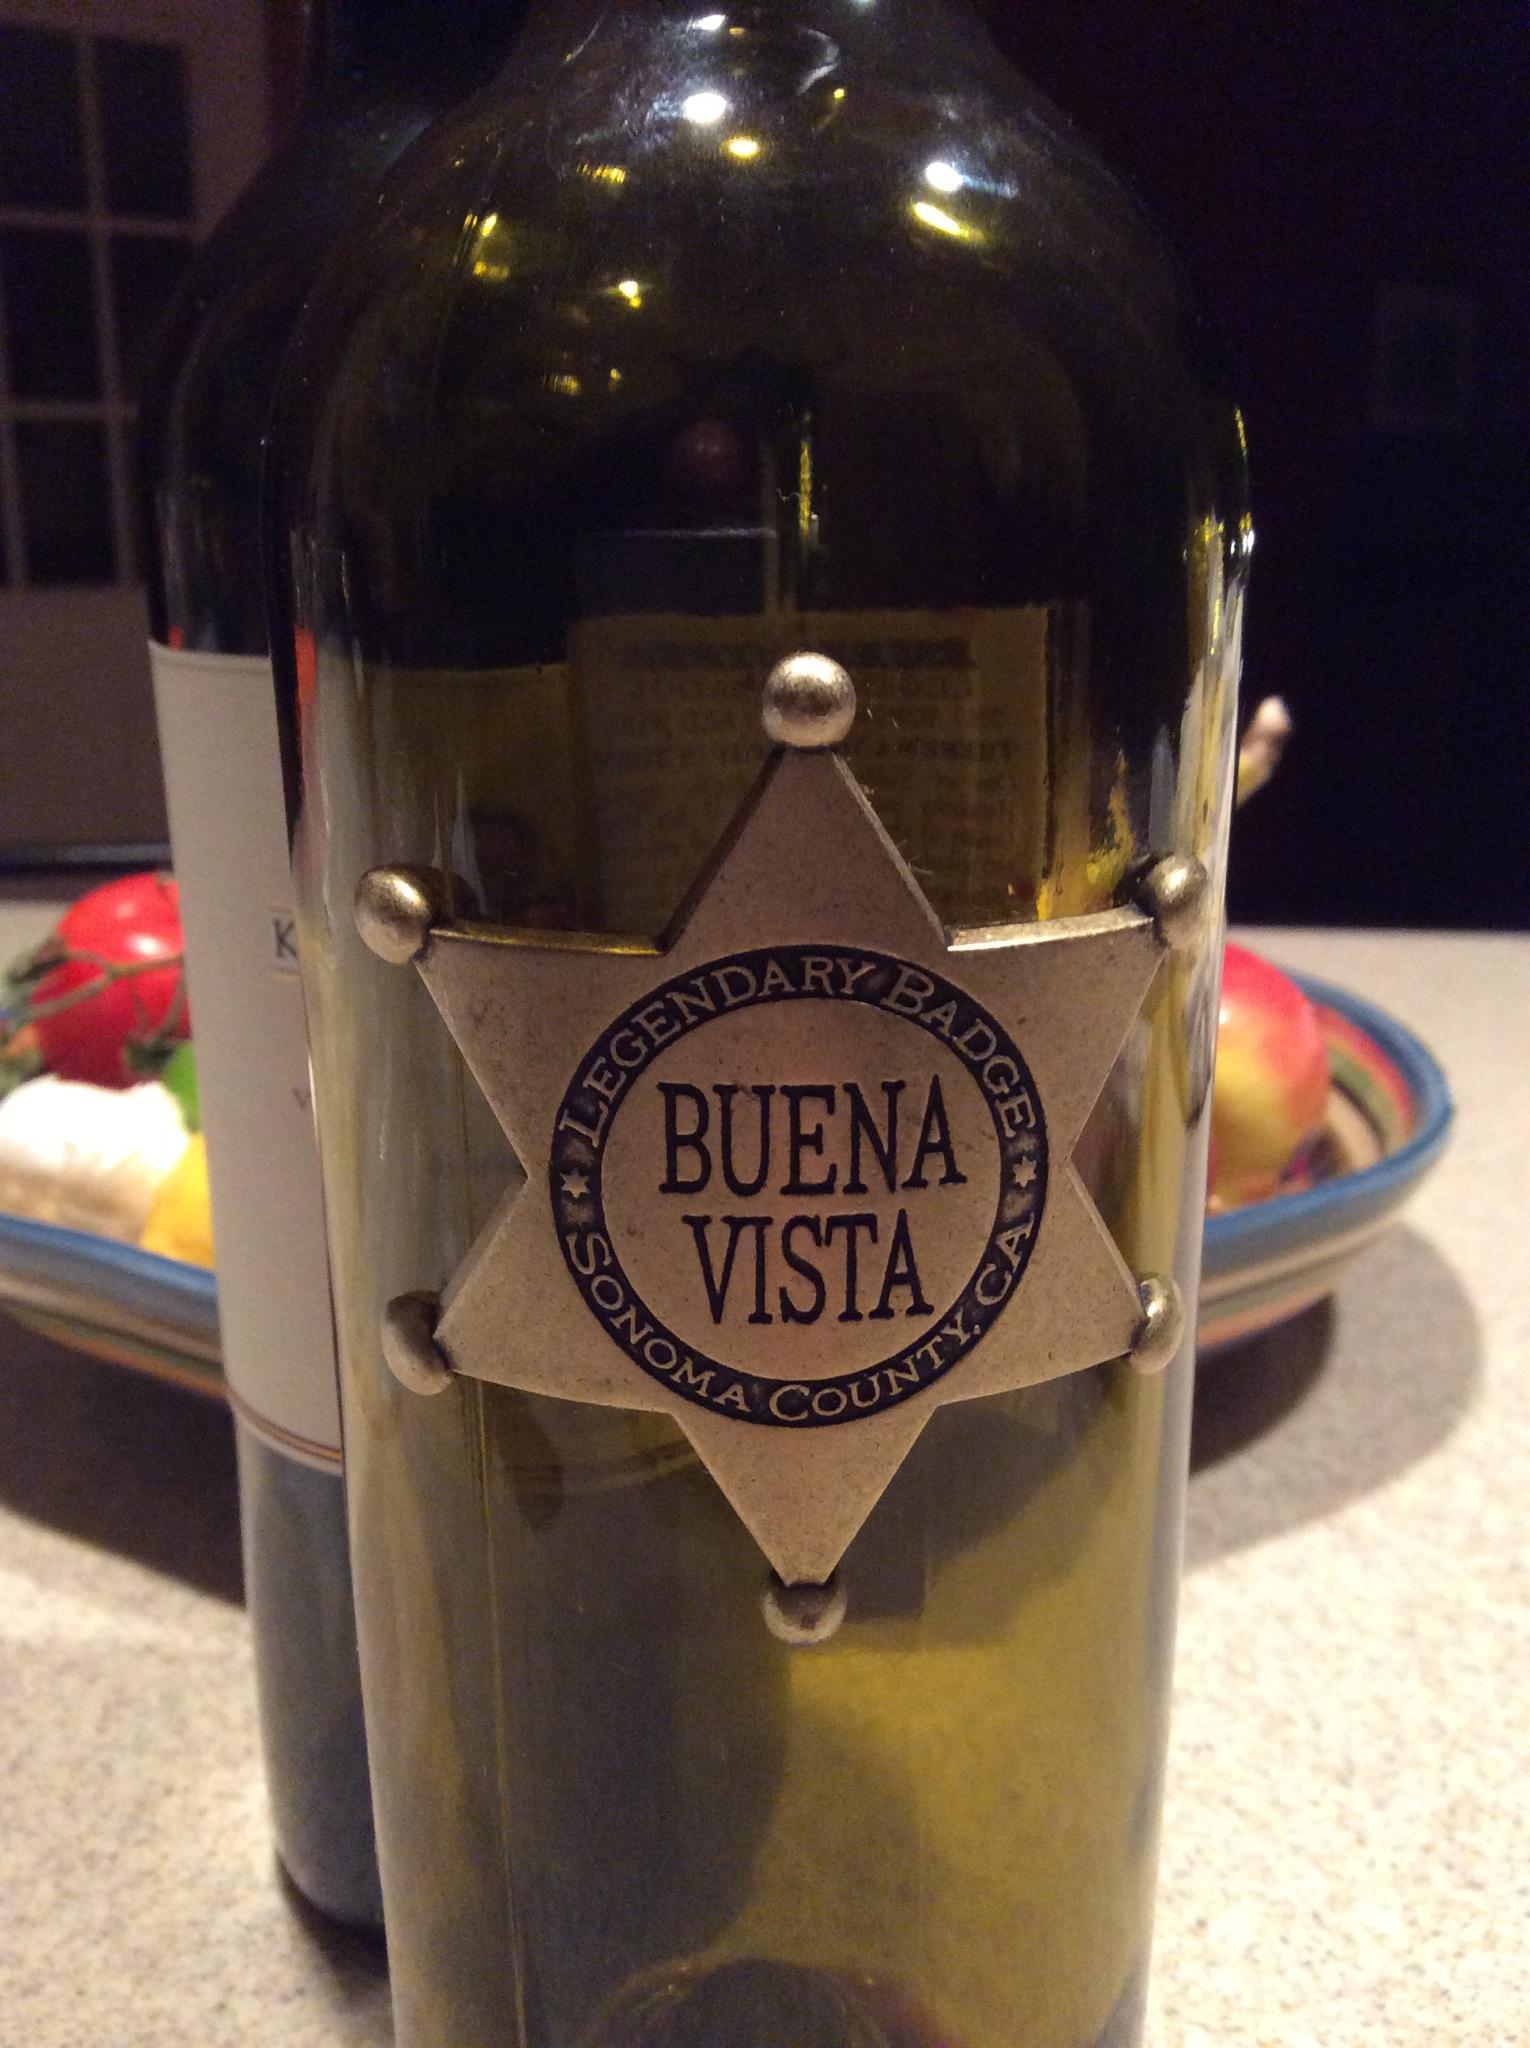 2012 Buena Vista Legendary Badge, Limited Edition, Sonoma, California, USA.